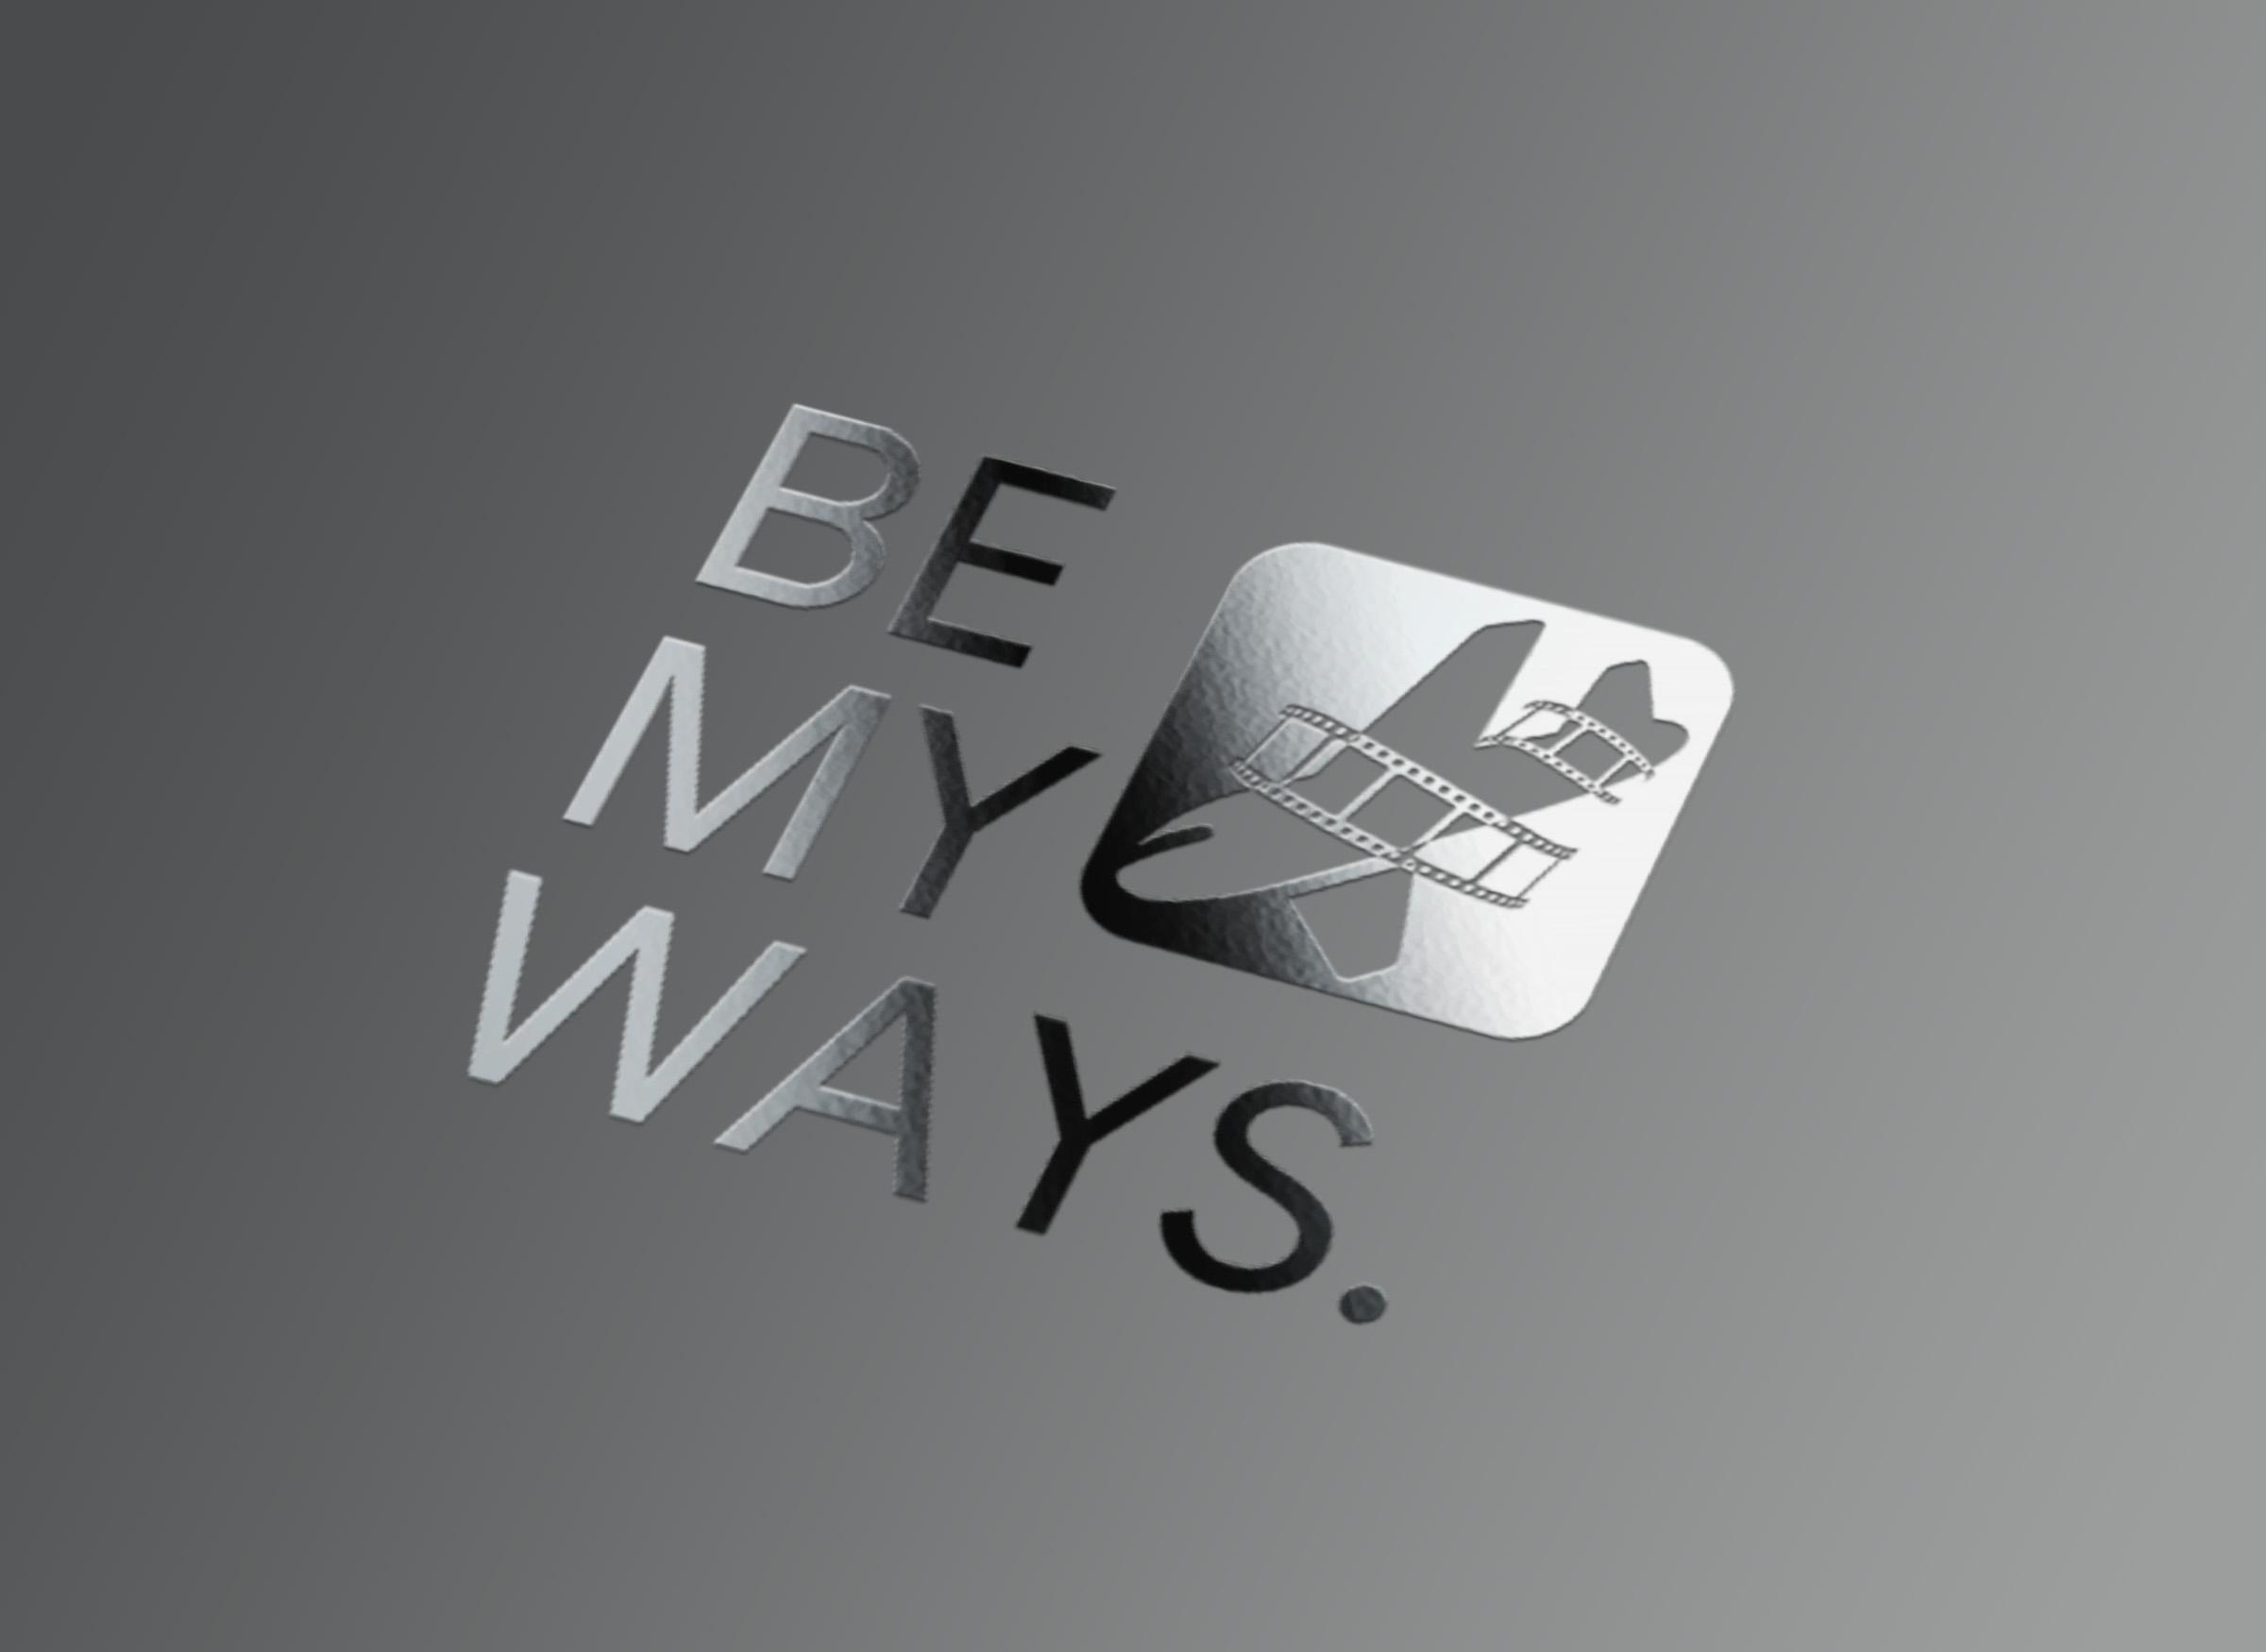 Разработка логотипа и иконки для Travel Video Platform фото f_7055c36634872b8e.jpg